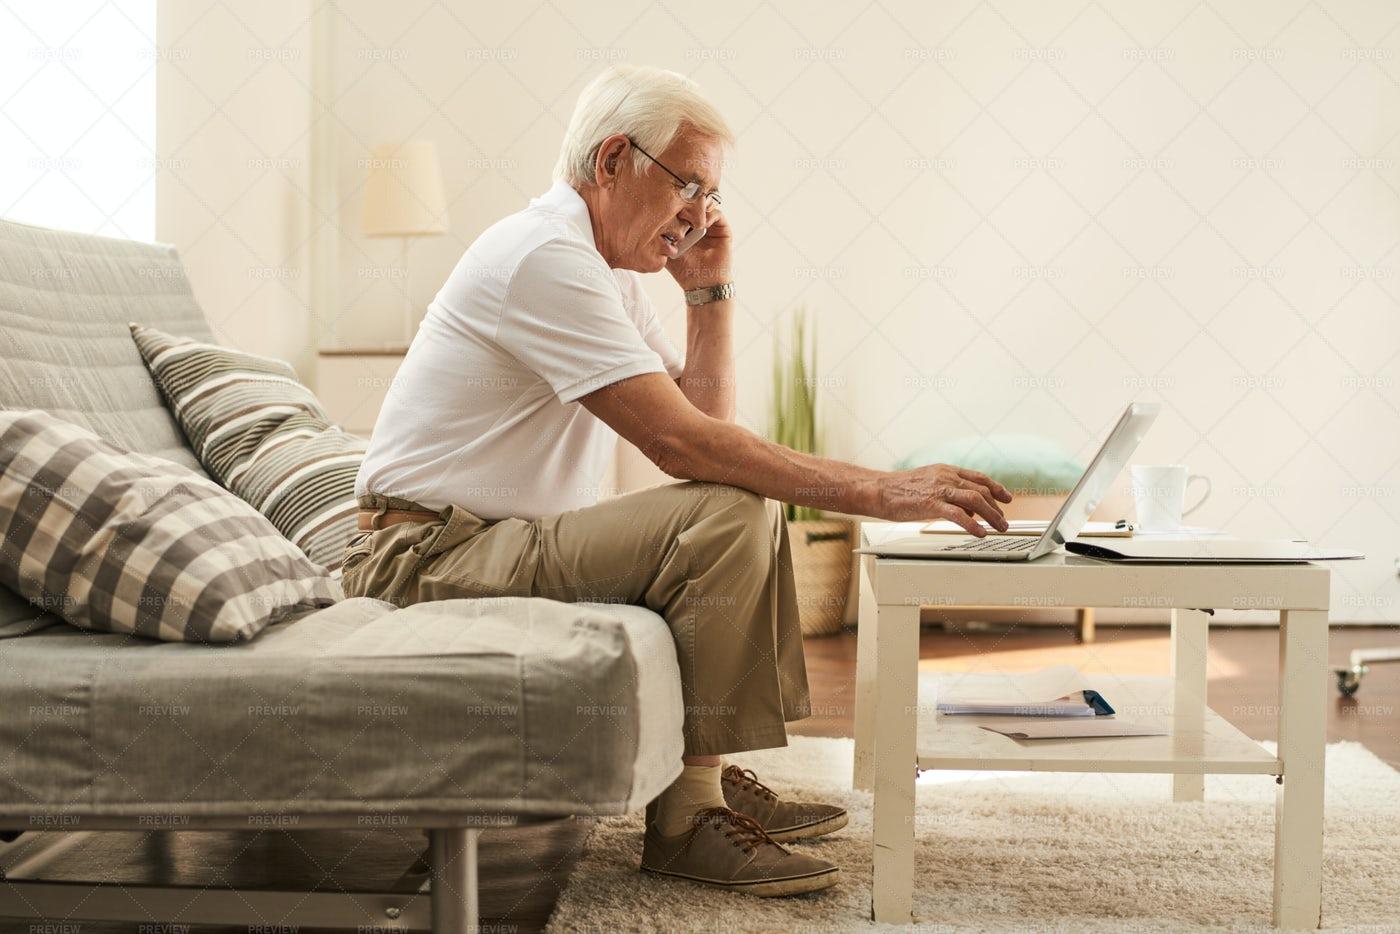 Senior Man Working In Living Room: Stock Photos